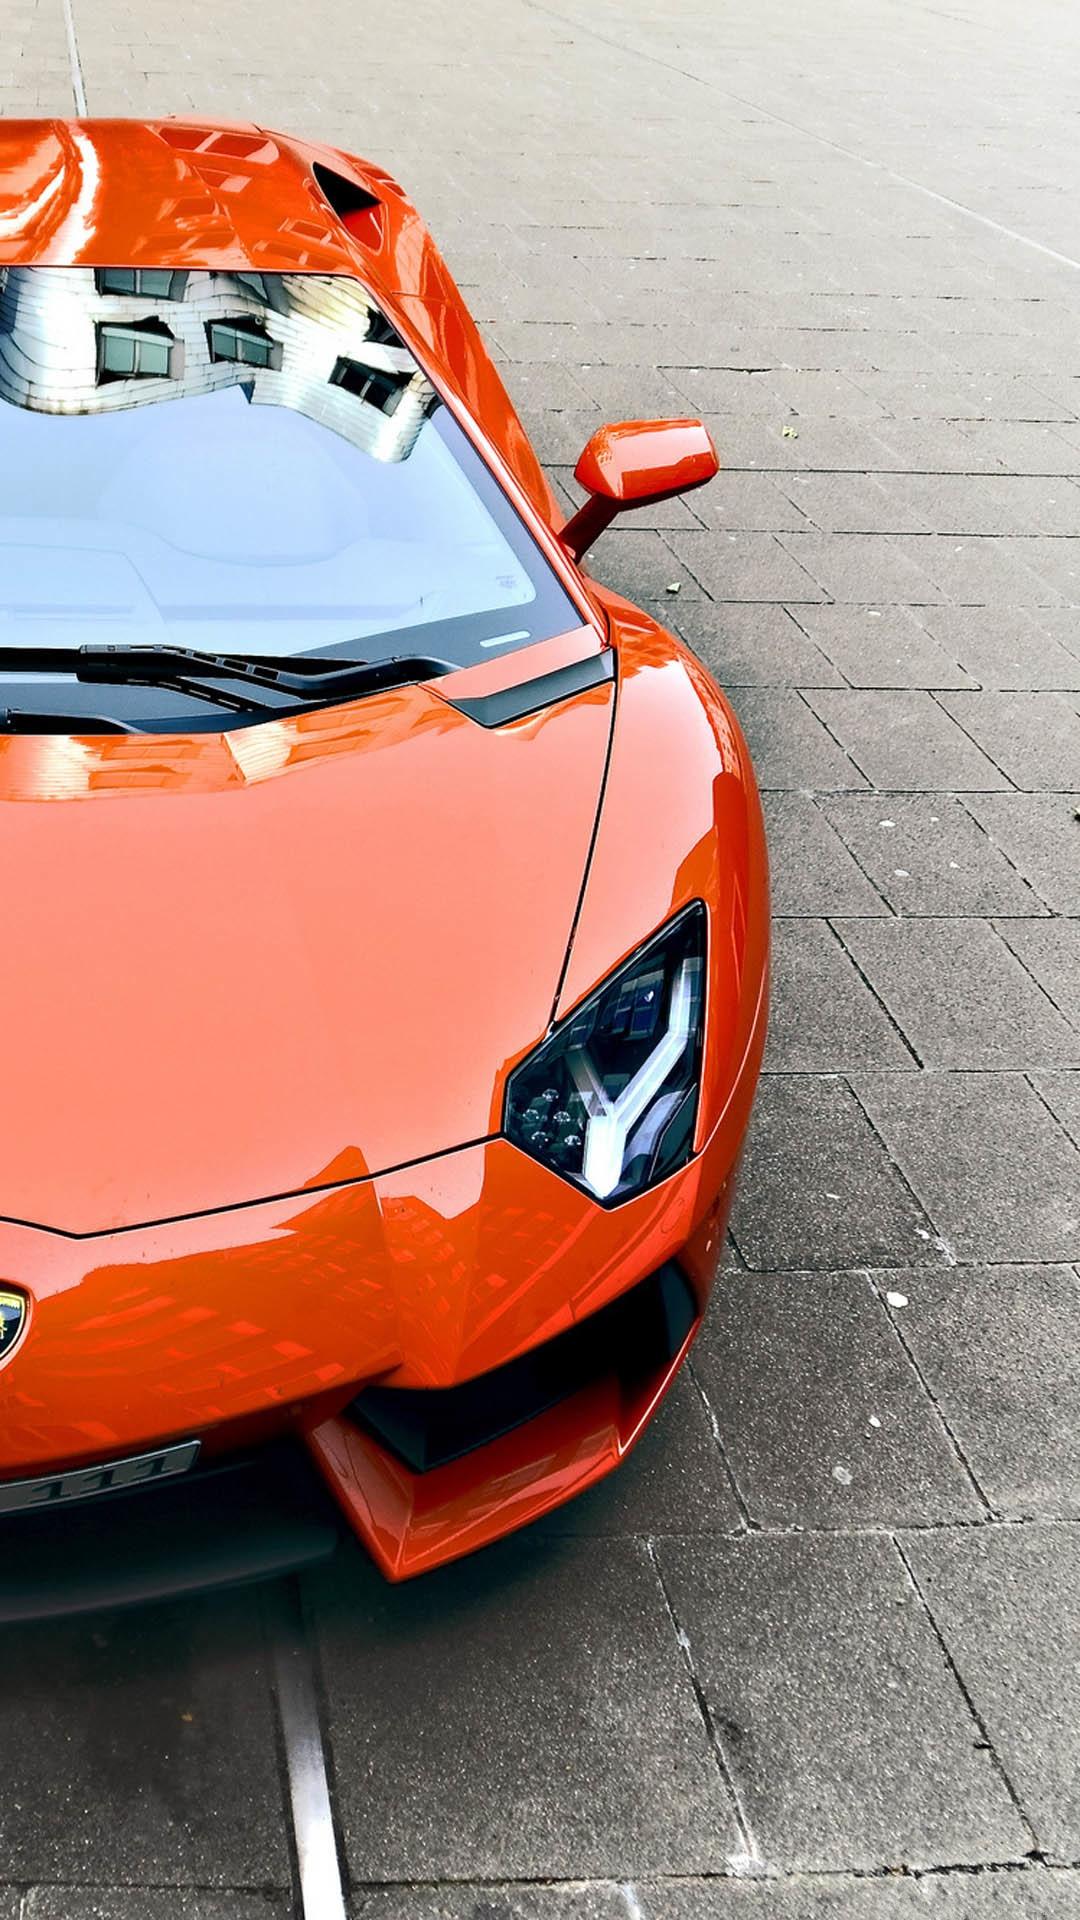 Samsung Mobile Hd Wallpapers Free Download Lamborghini Aventador Htc Hd Wallpaper Best Htc One